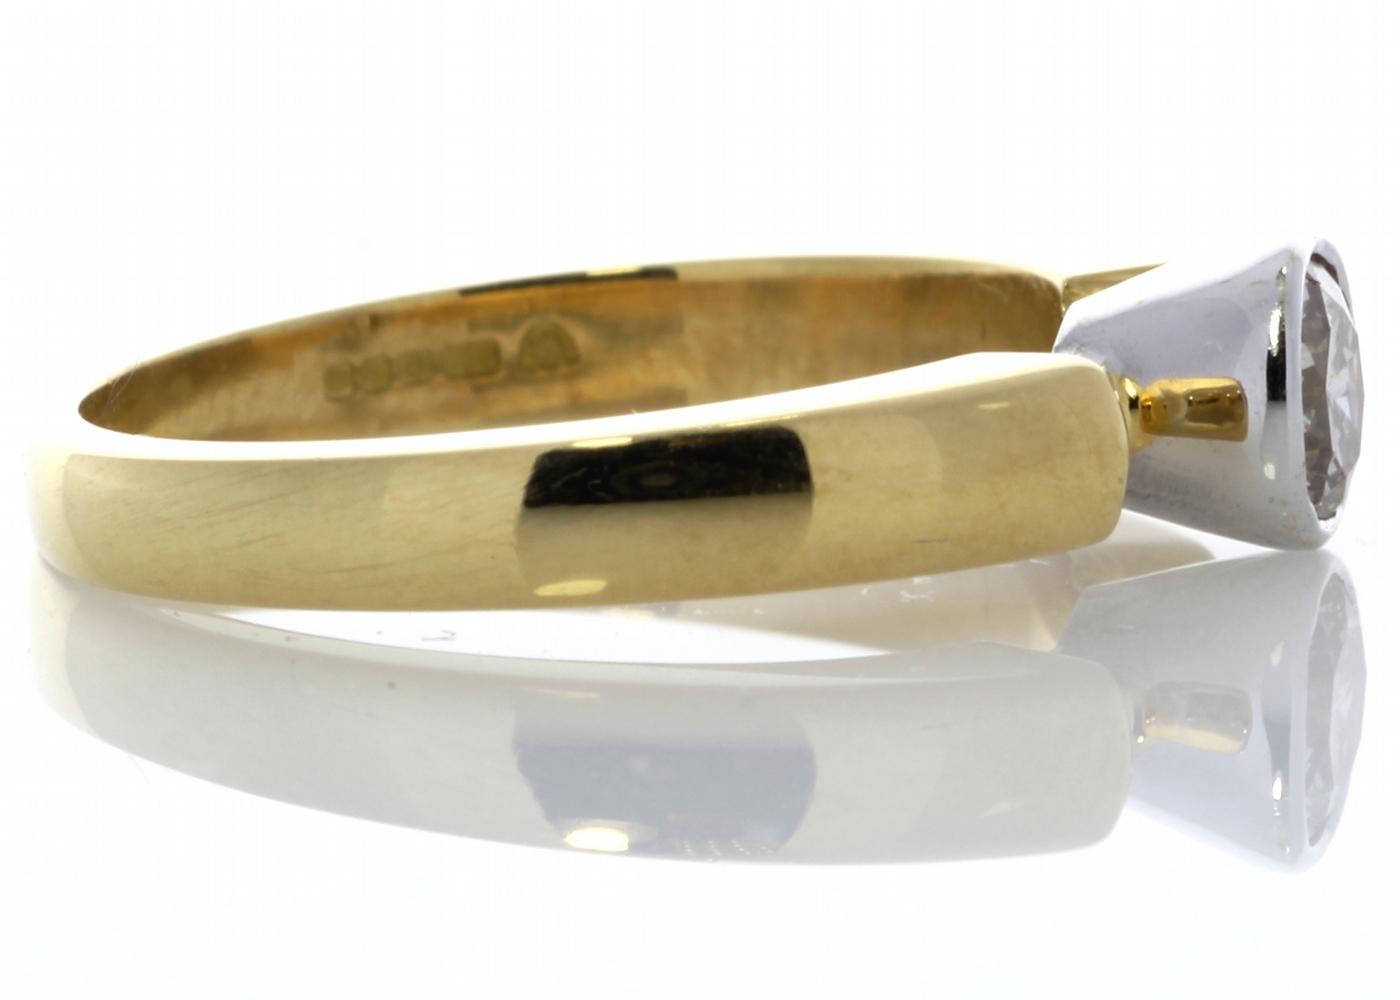 18ct Rub Over Set Diamond Ring 0.53 Carats - Image 3 of 5